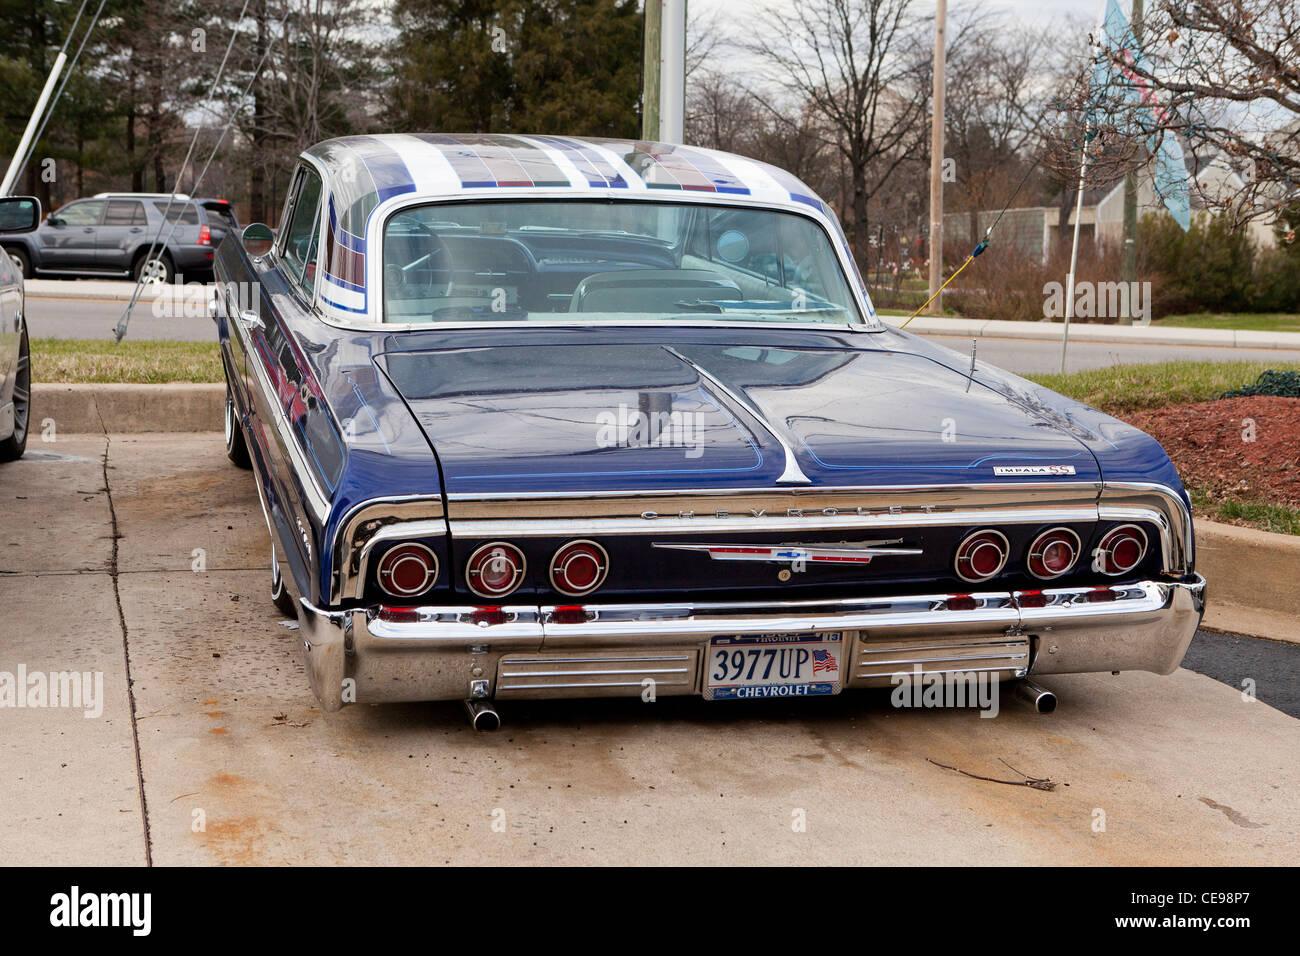 1964 chevy impala lowrider stock image